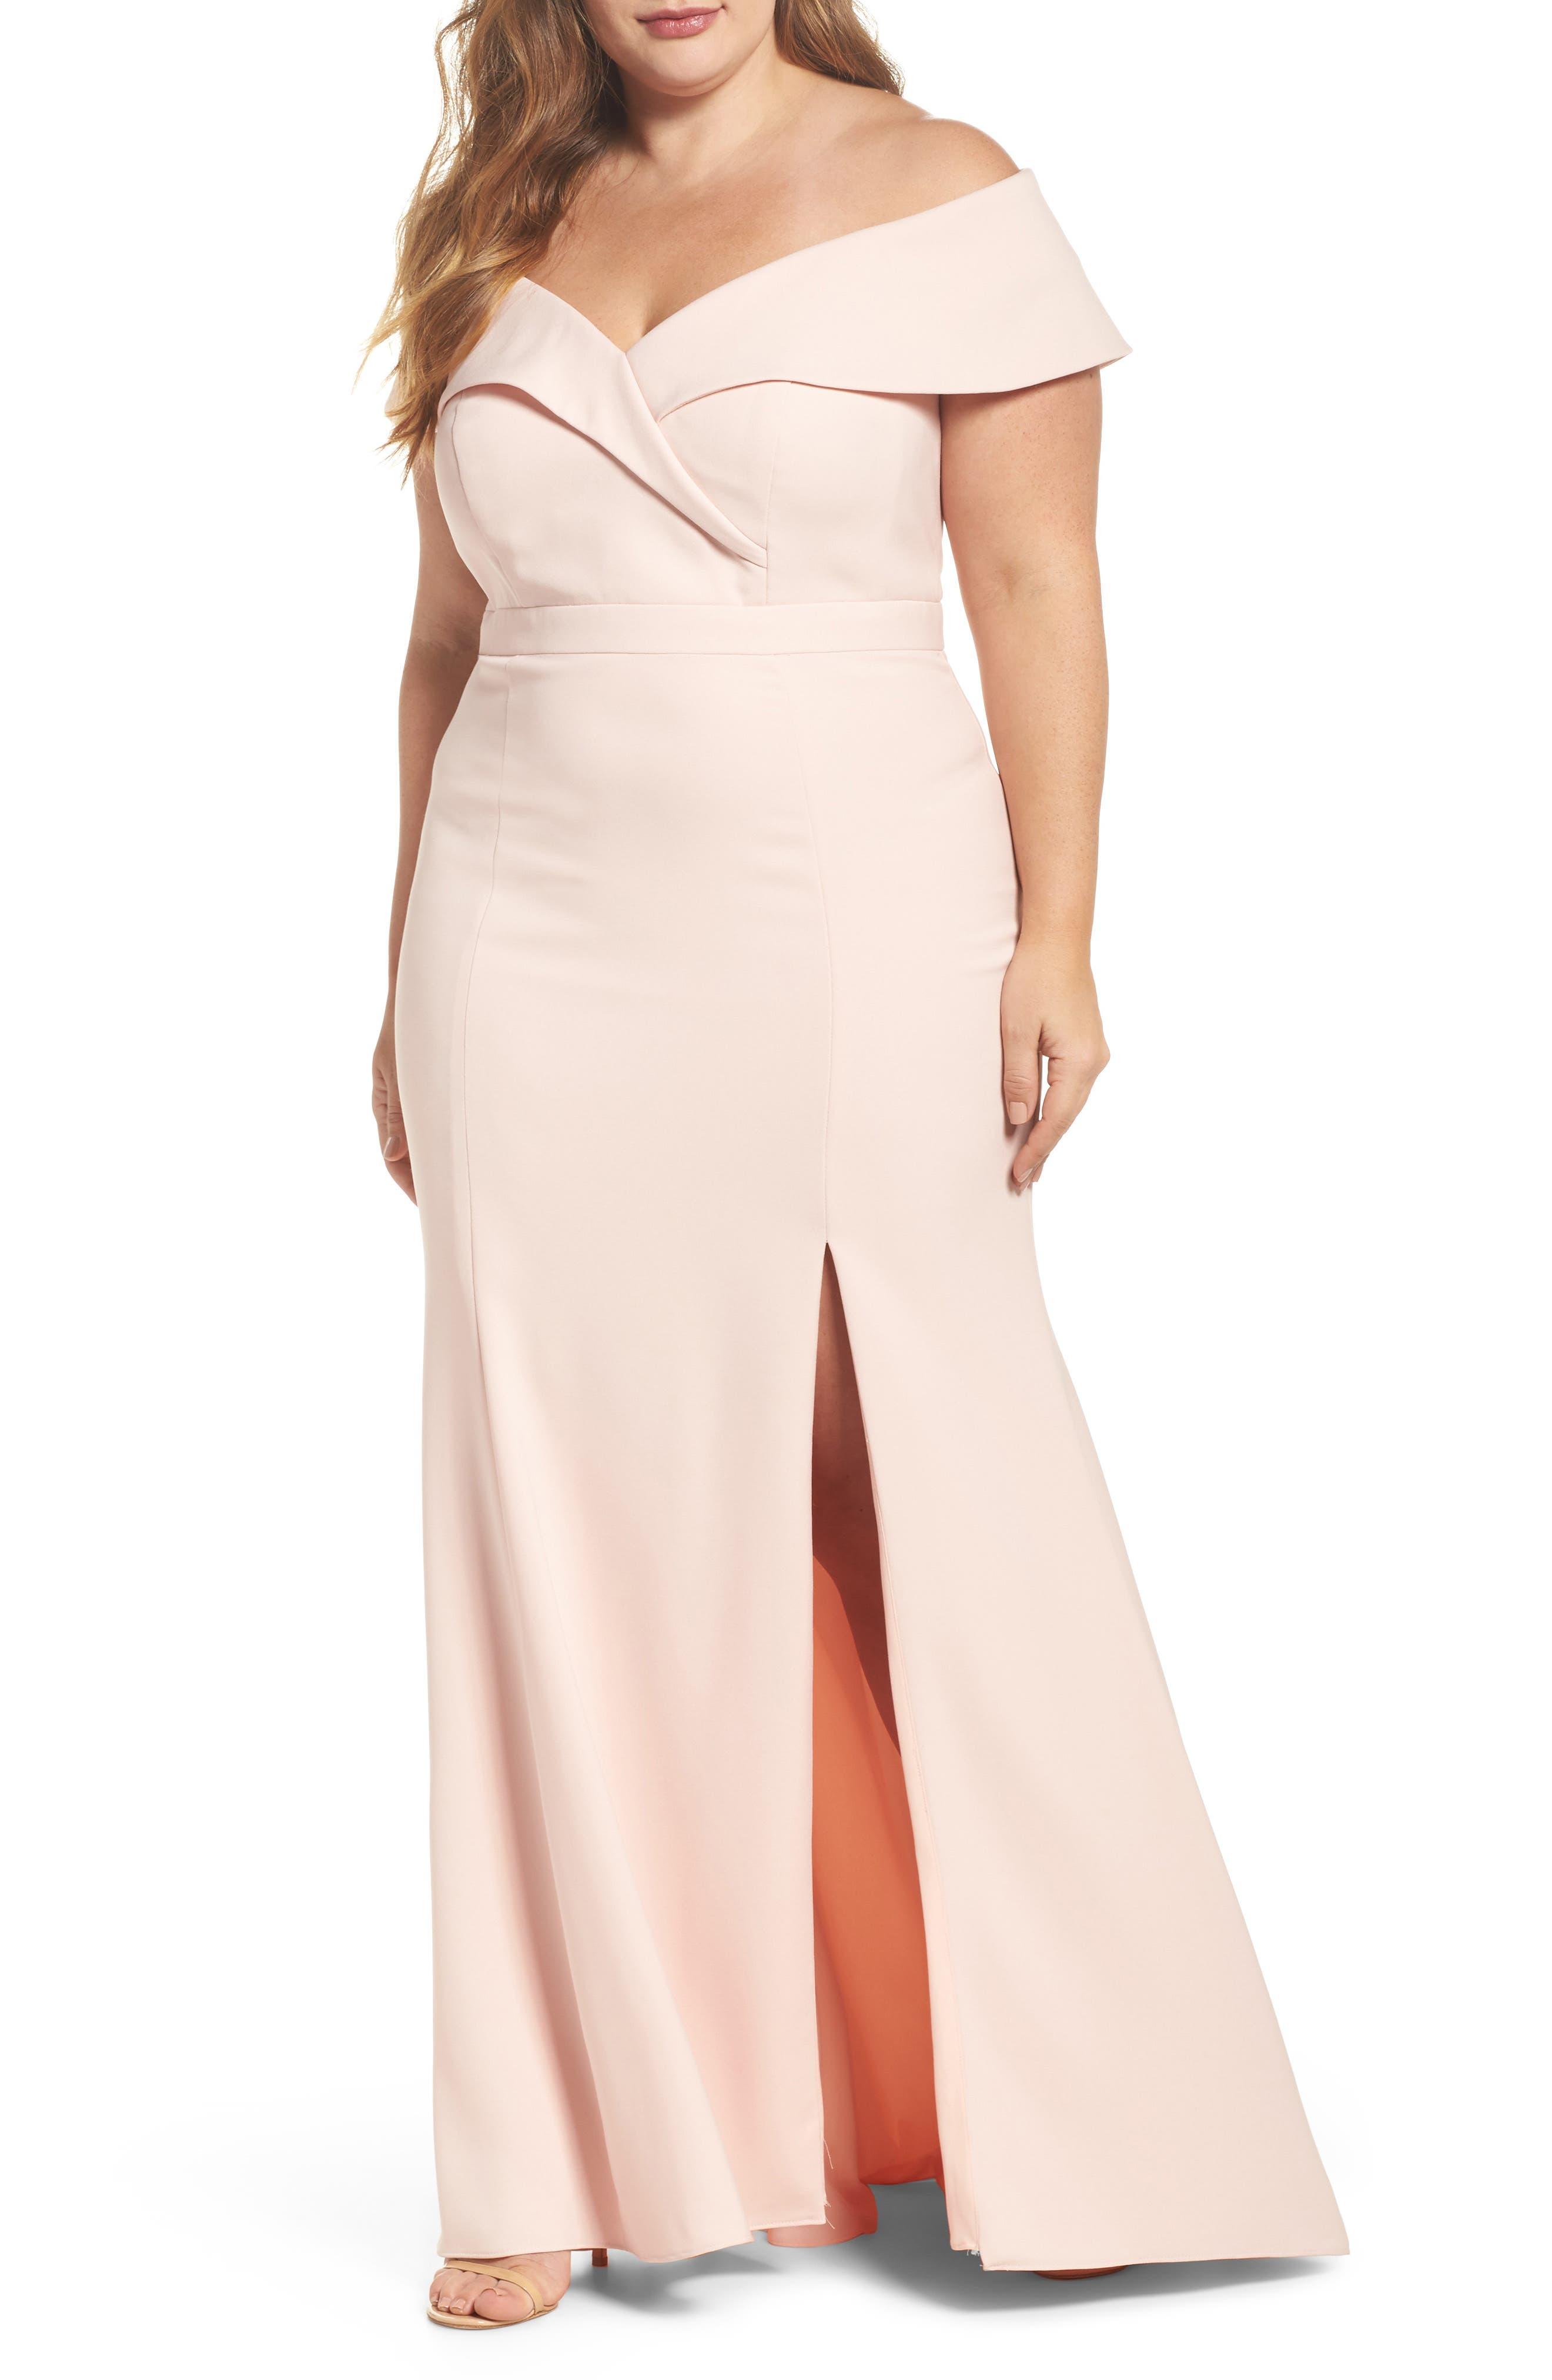 Off the Shoulder Front Slit Crepe Dress,                             Main thumbnail 1, color,                             Blush